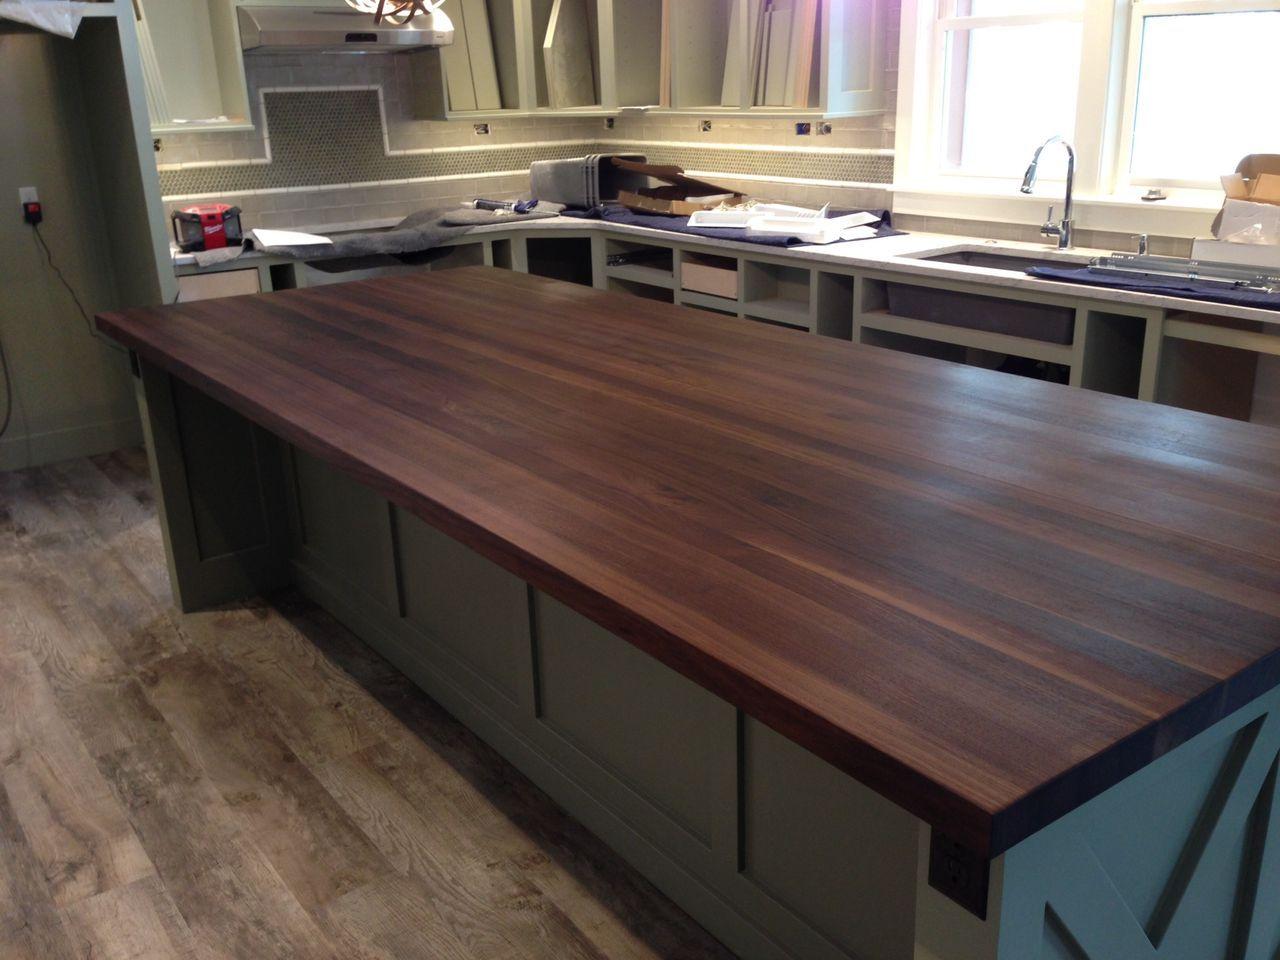 Custommade walnut butcher block countertop by mcclure tables